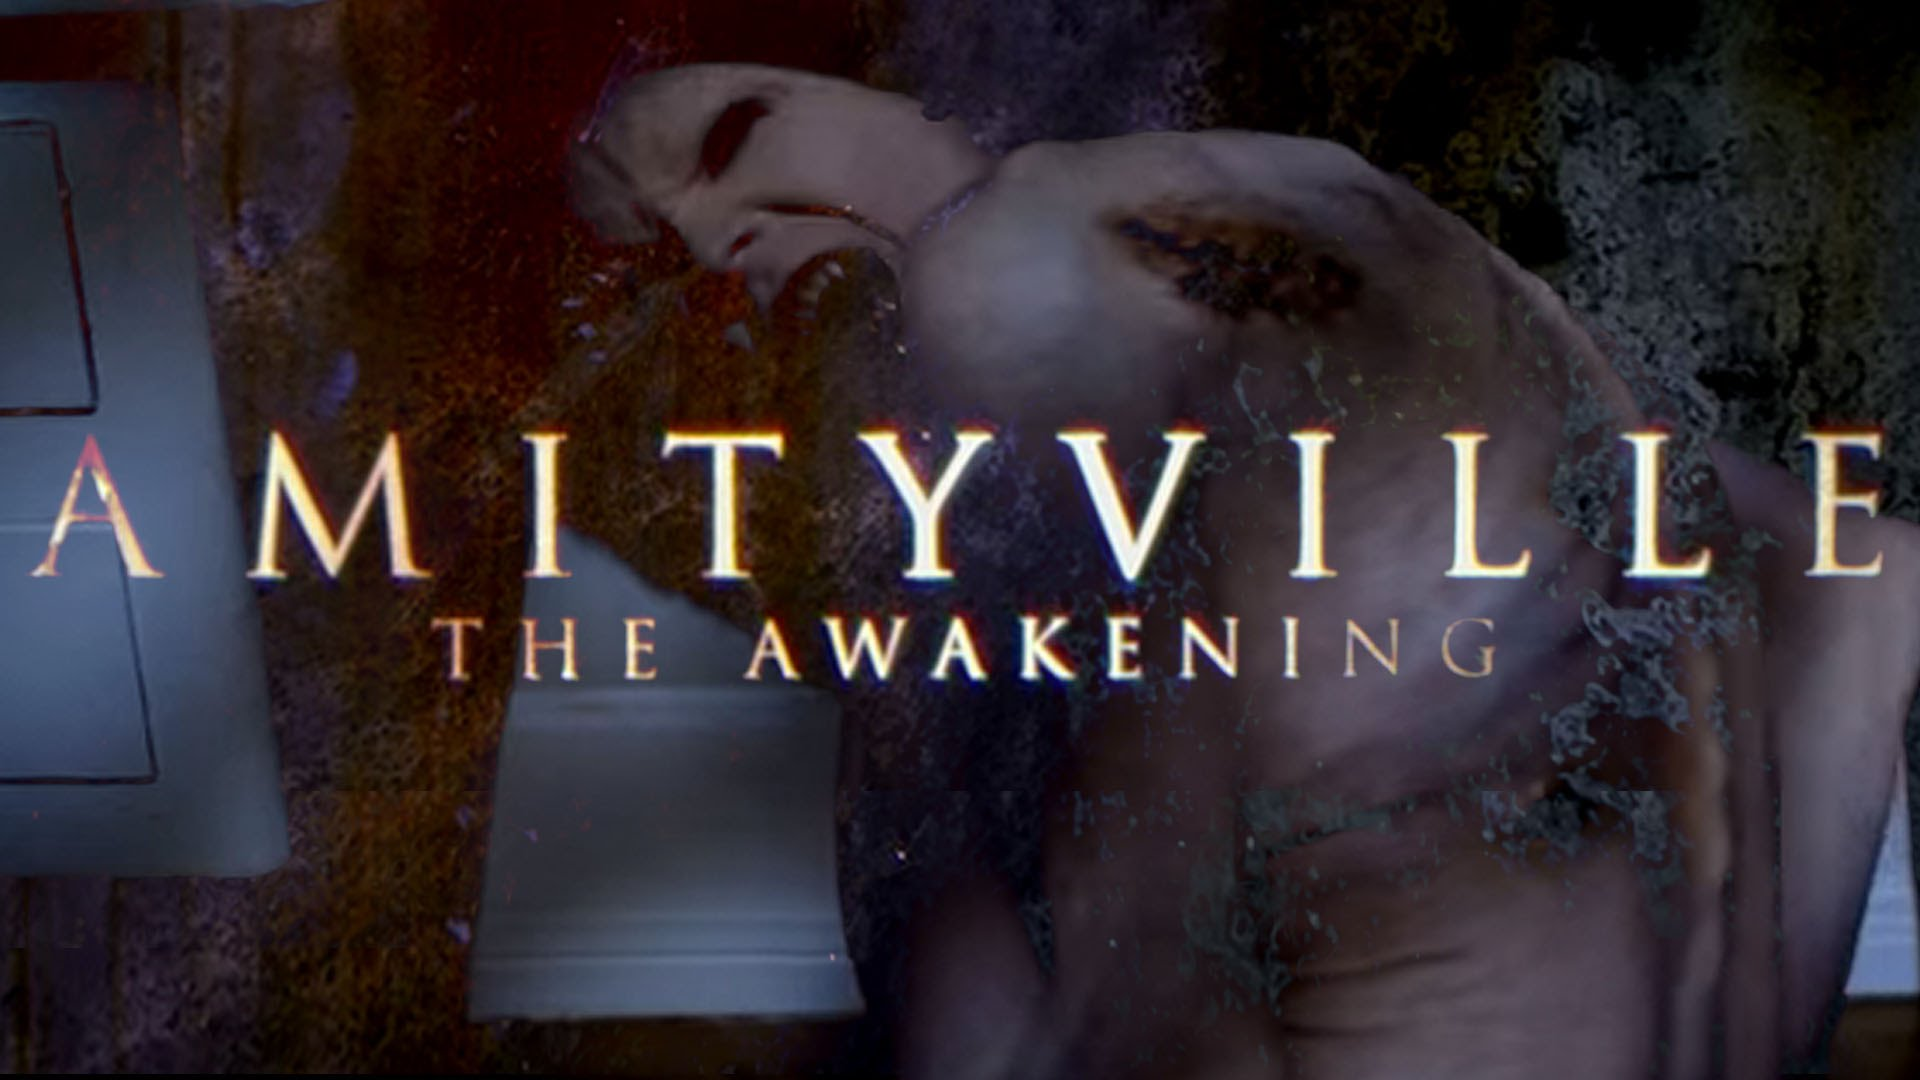 amityville horror thème télécharger